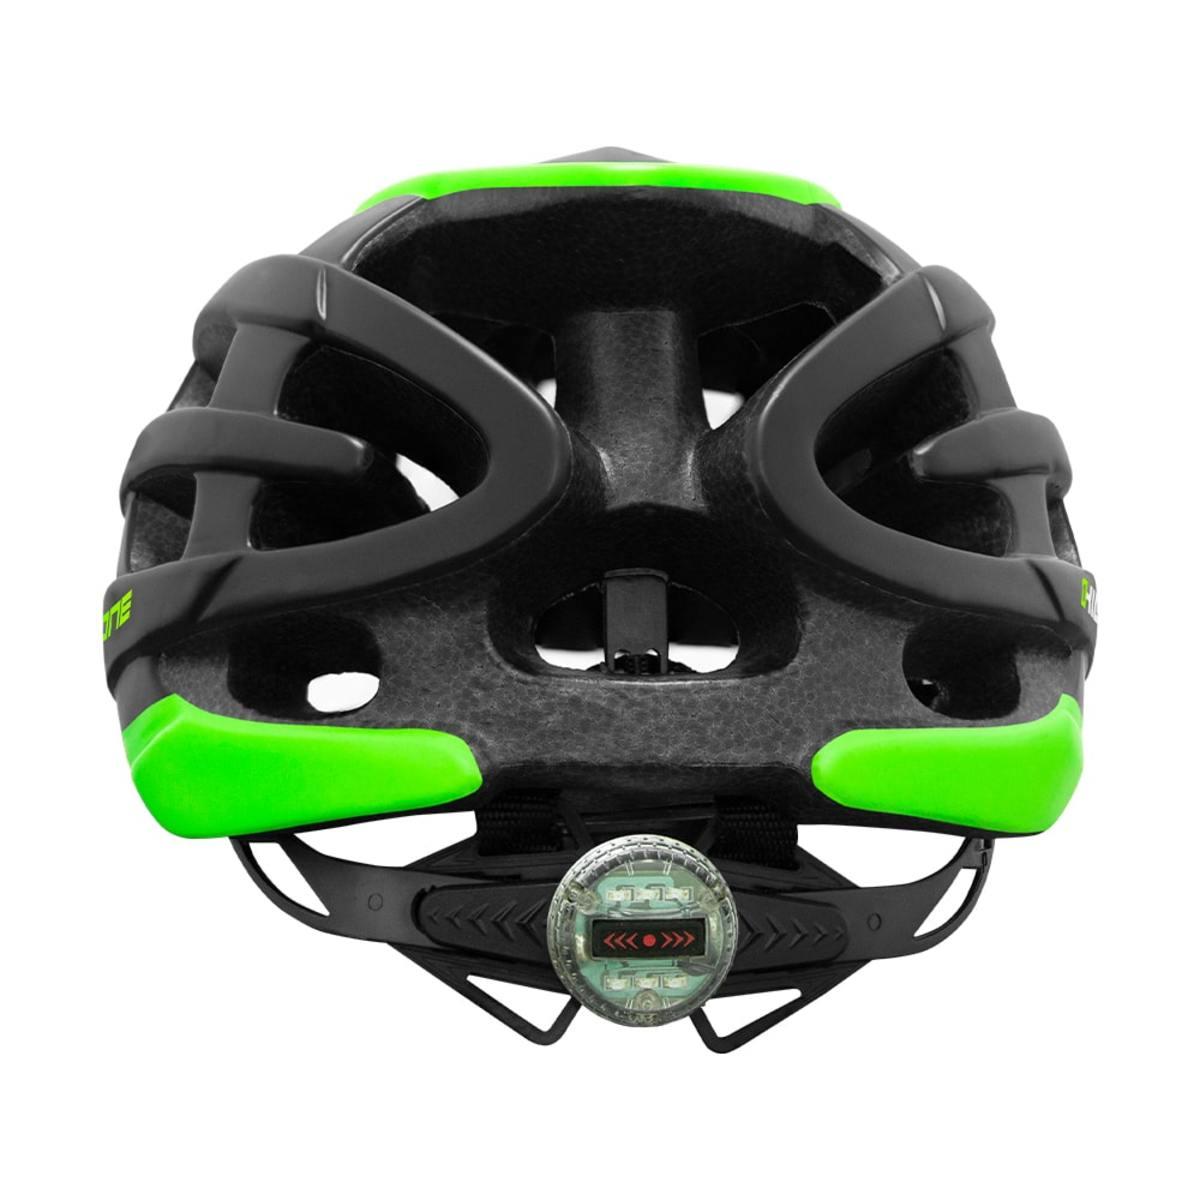 Capacete High One Mtb T/G Preto/Verde + Óculos Casco